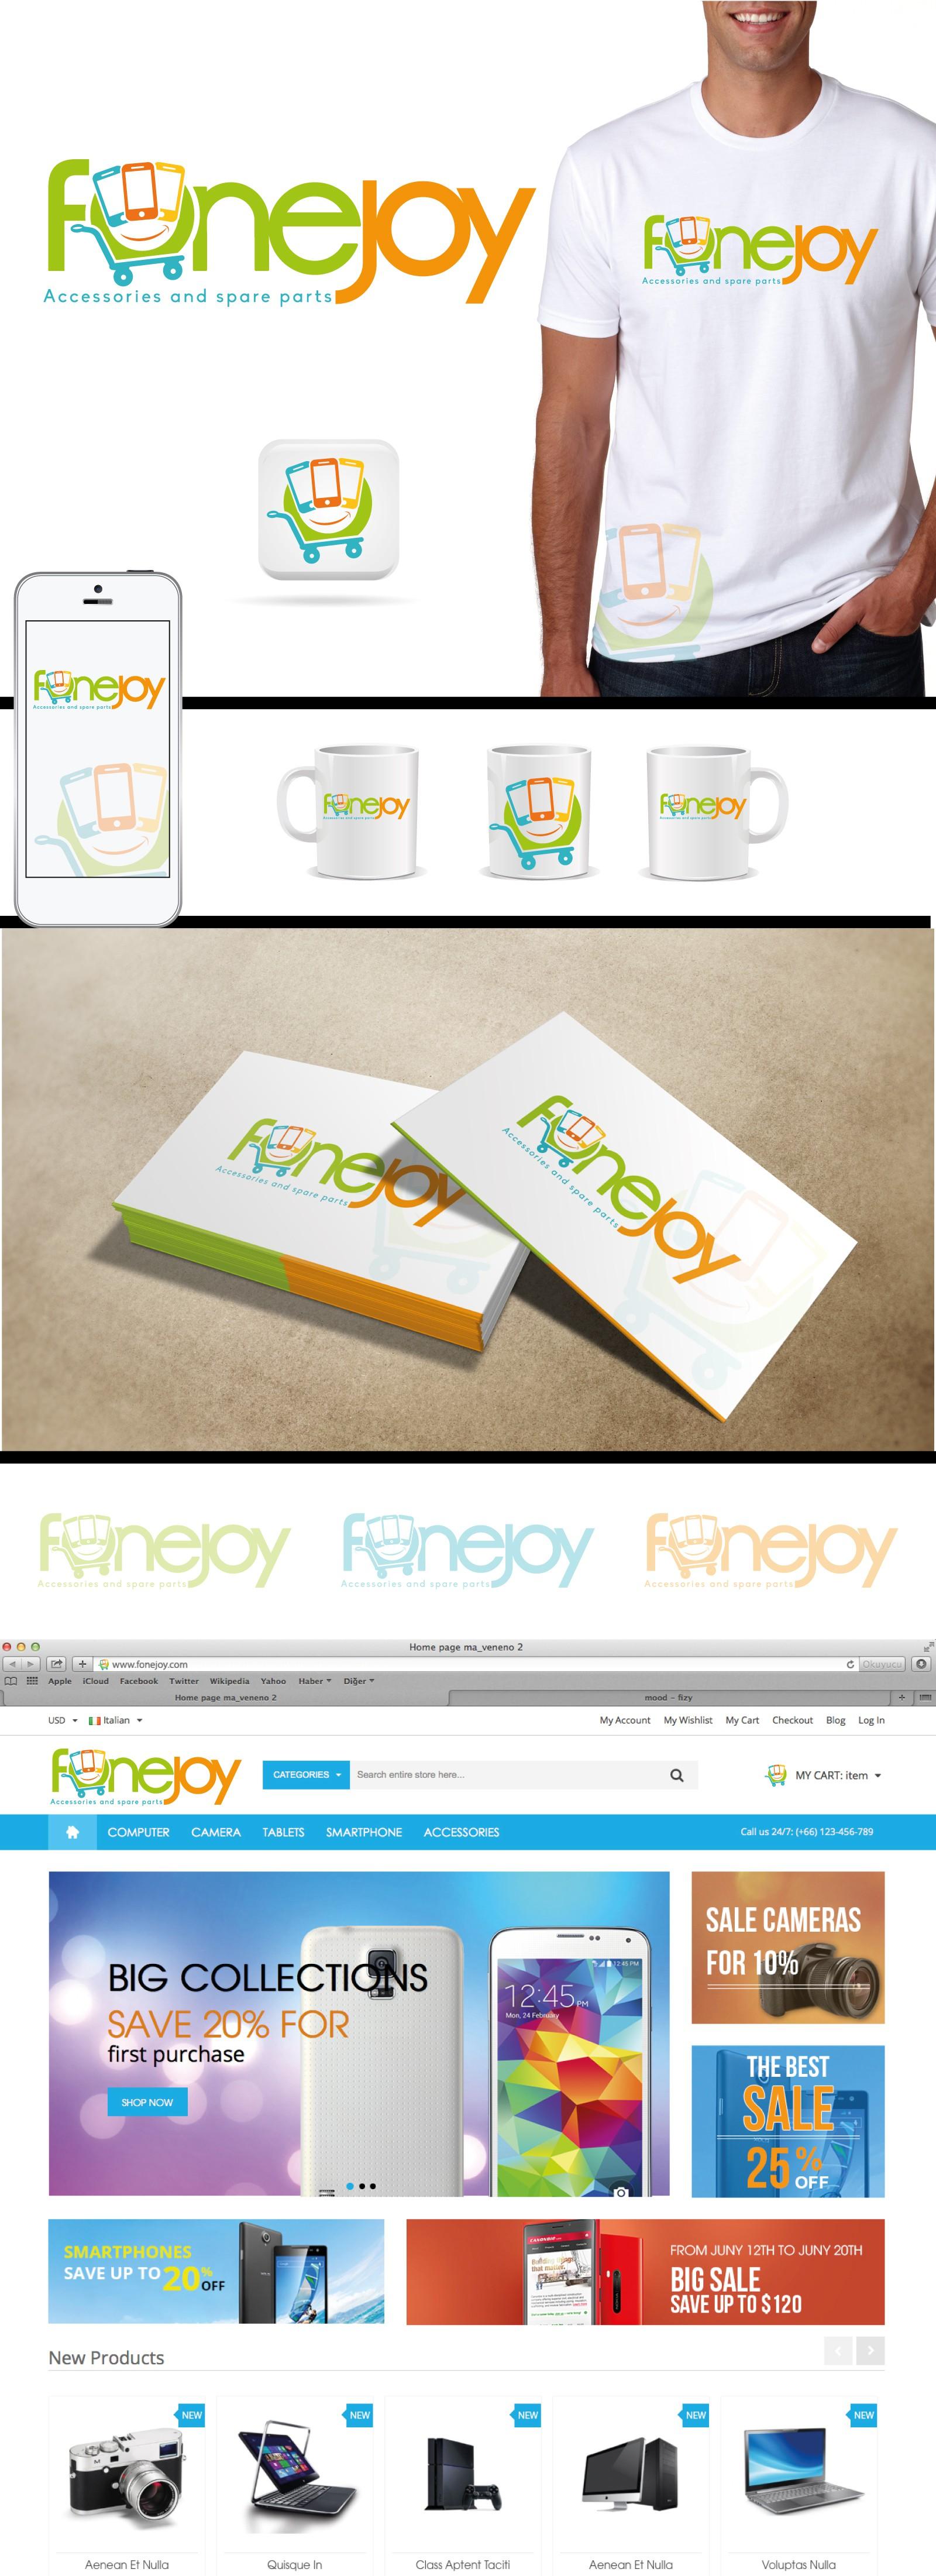 Design a fun modern logo for Fonejoy